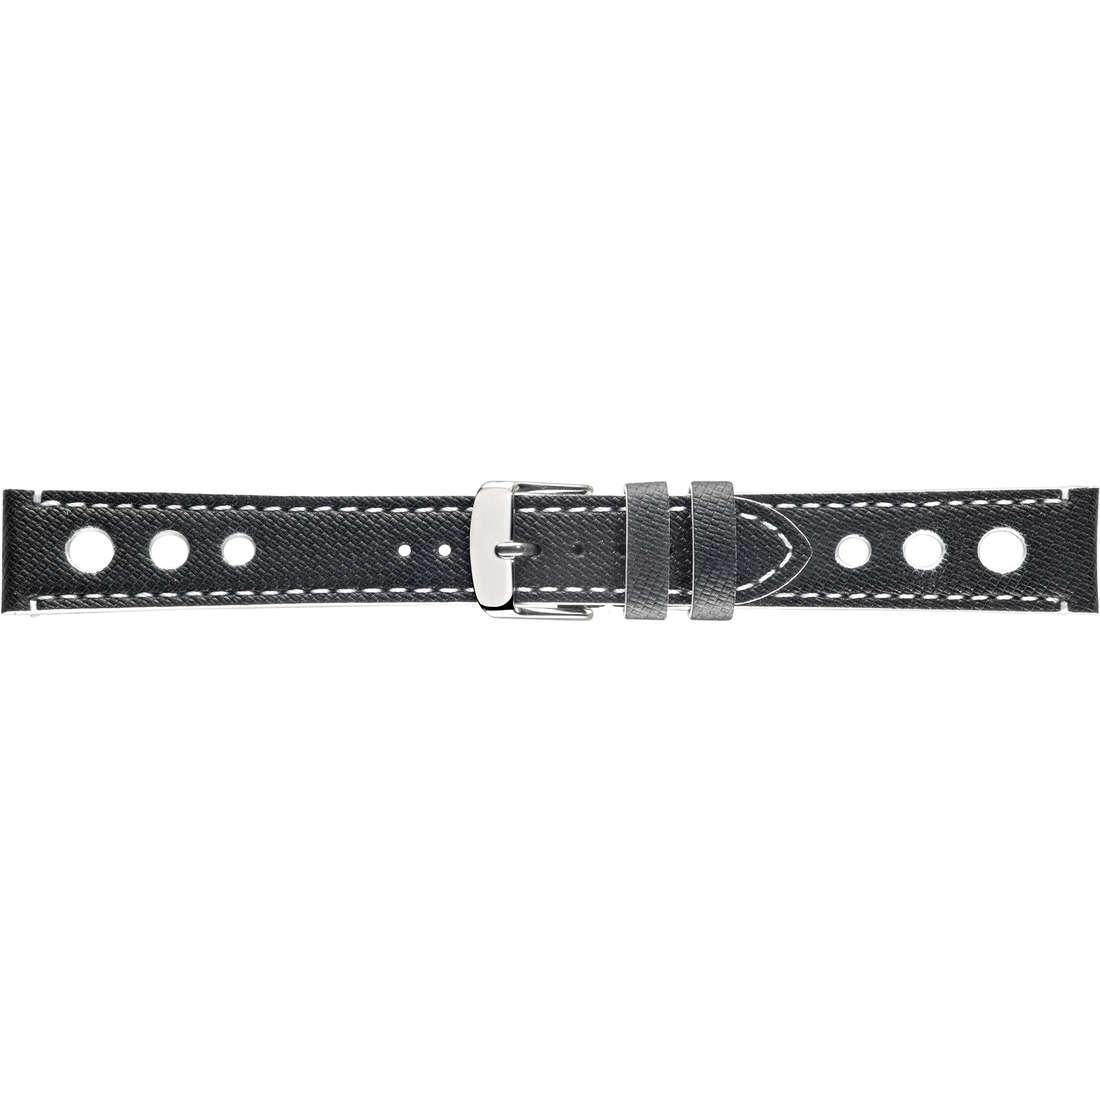 montre bande de montres homme Morellato Linea Sport A01X4498B24817CR22